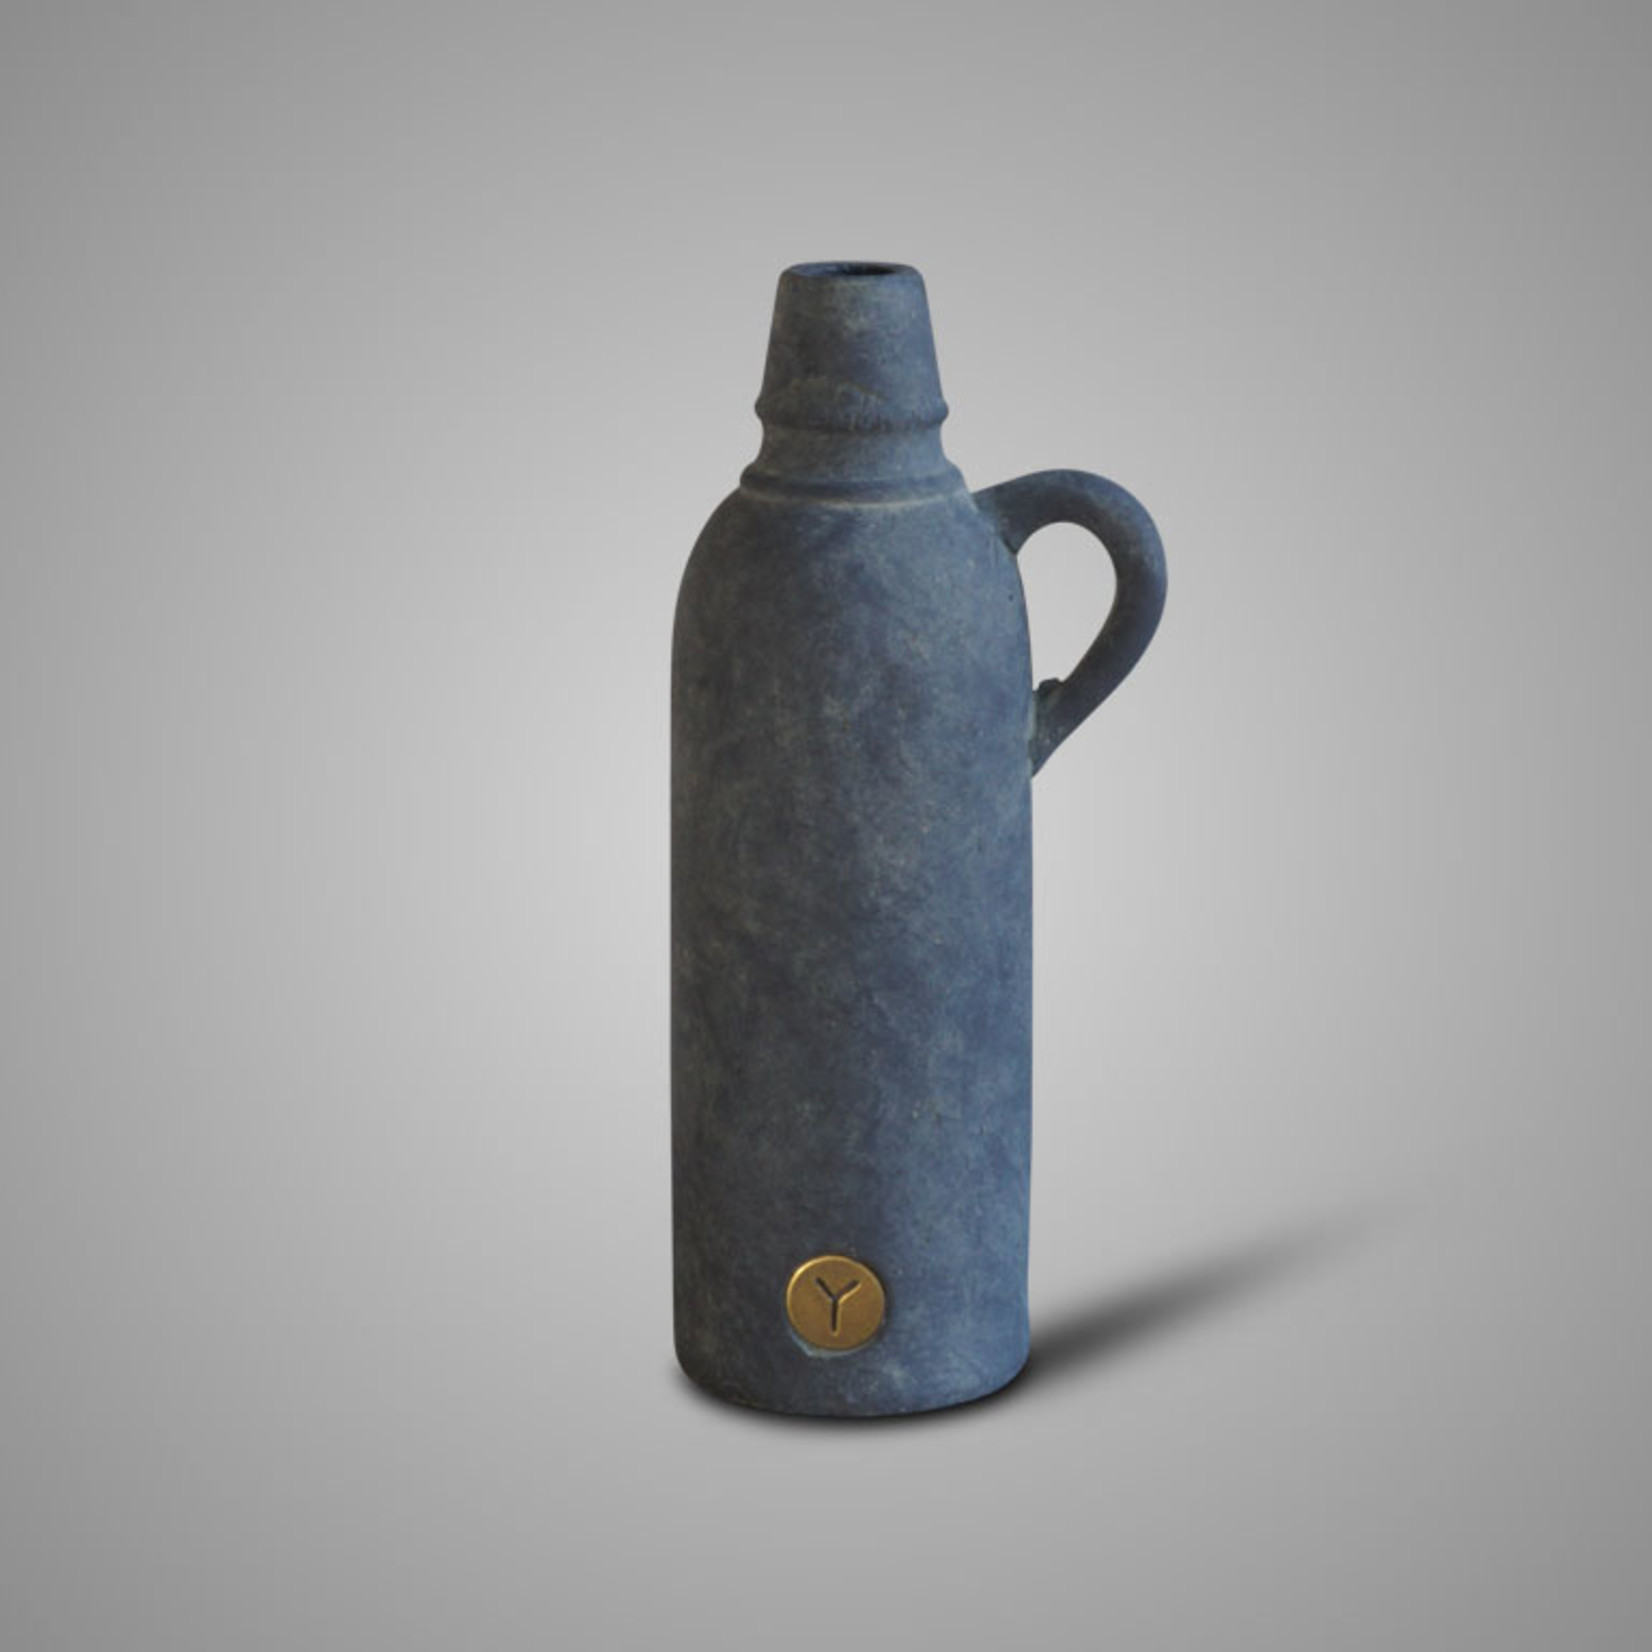 Brynxz Brynxz Bottle With Ear Majestic Vintage M